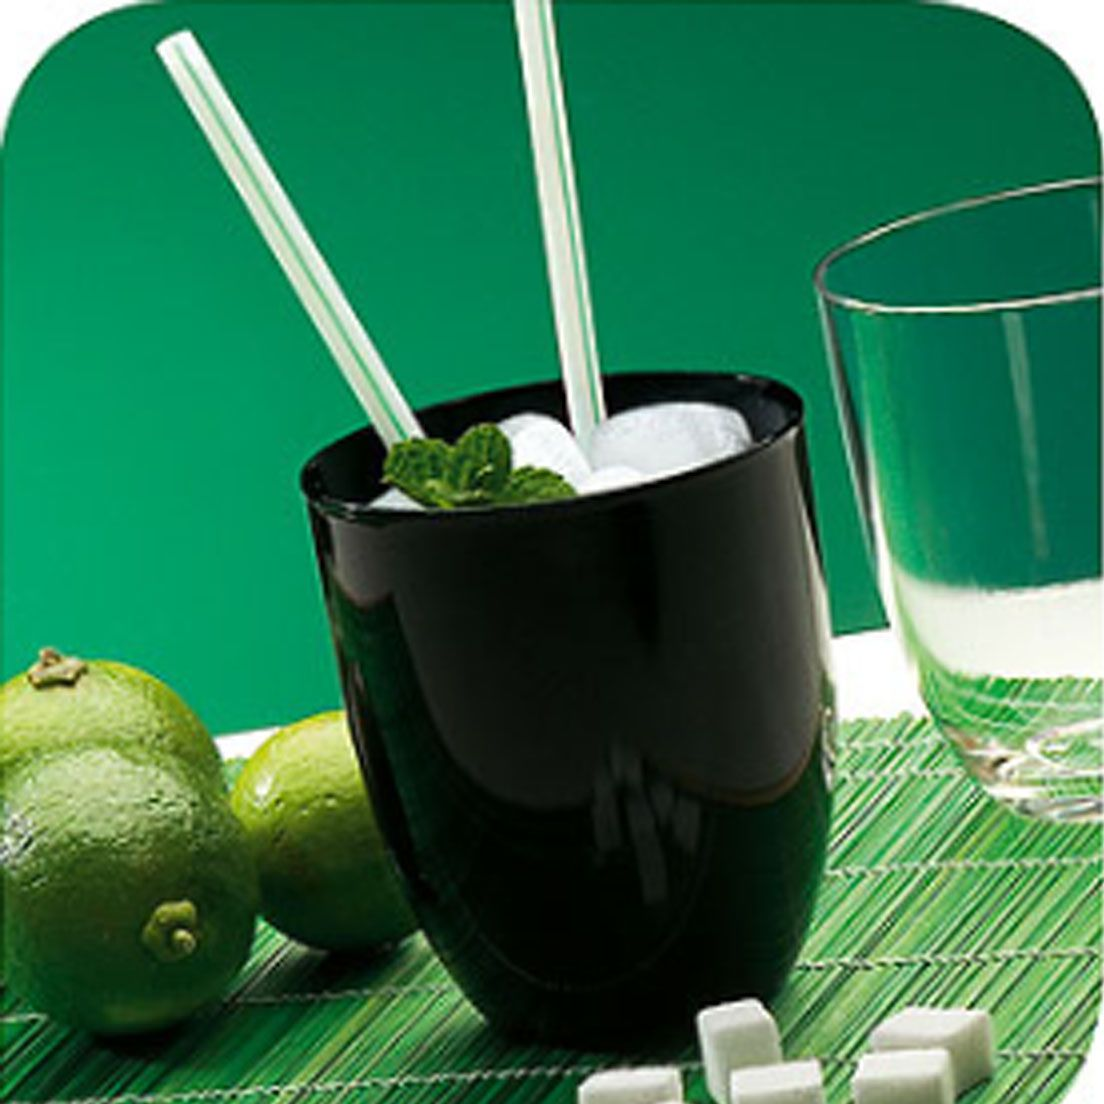 Copo 400Ml para Drinks de Acrílico Cocktail